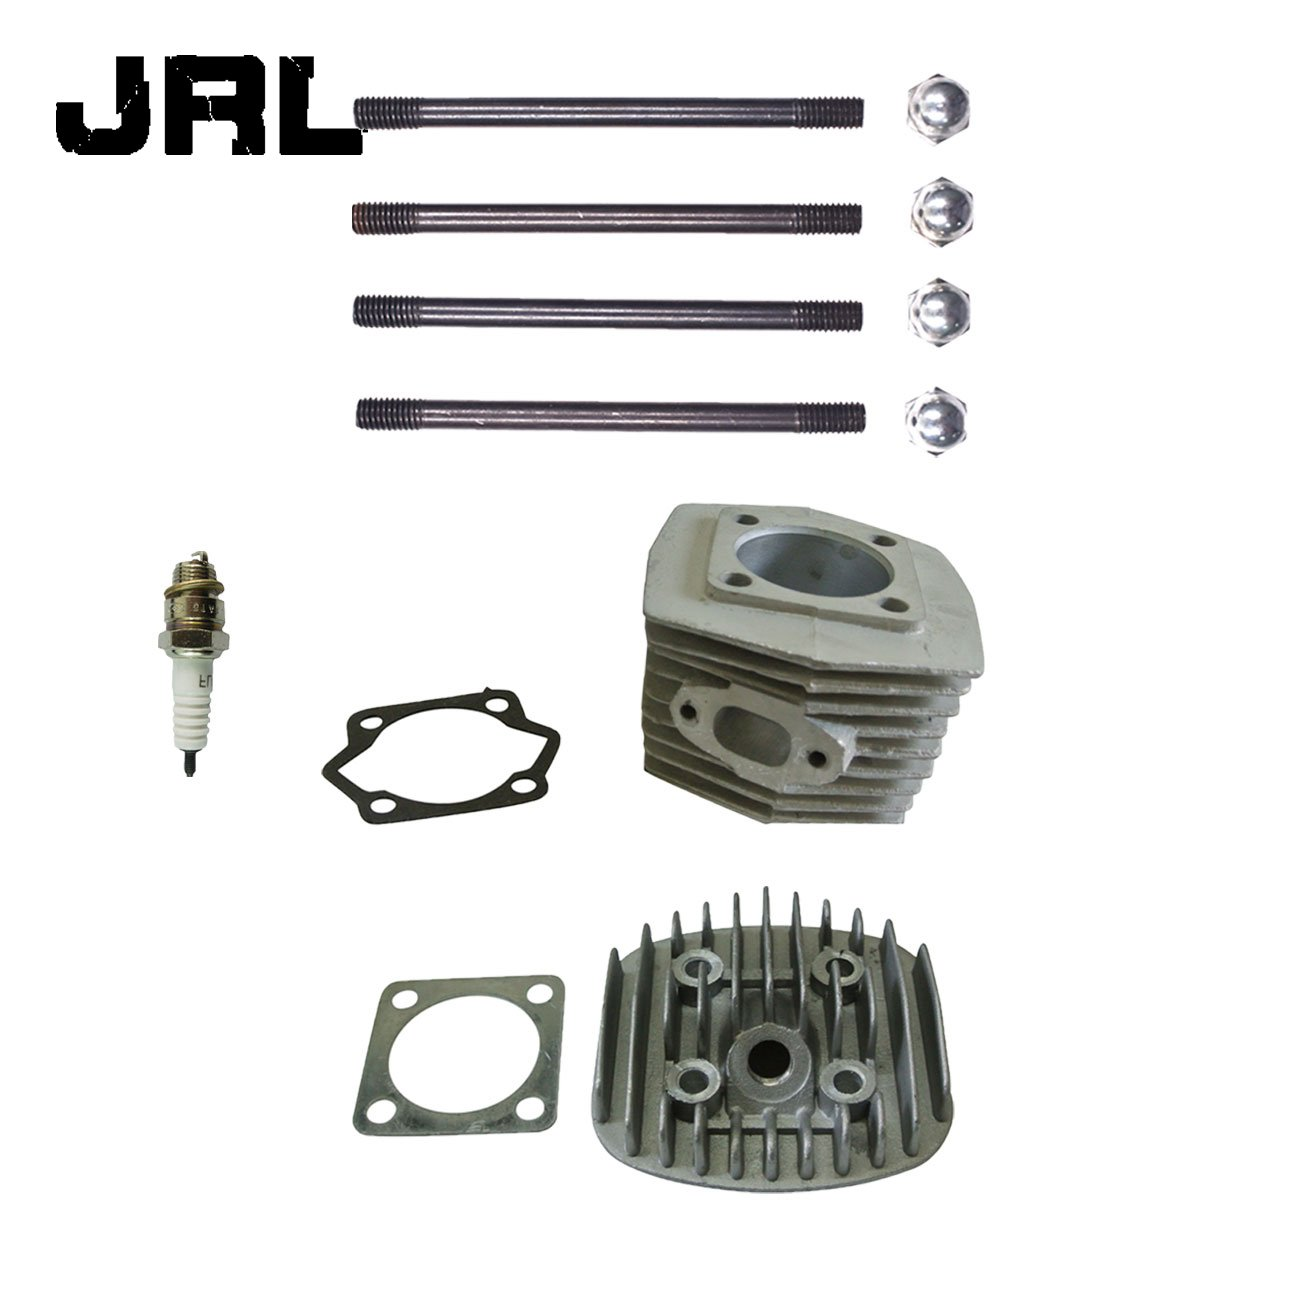 JRL Cylinder Head&Spark Plug&Cylinder& 4x Screws For 80cc Motorized Bicycle Nantong Power